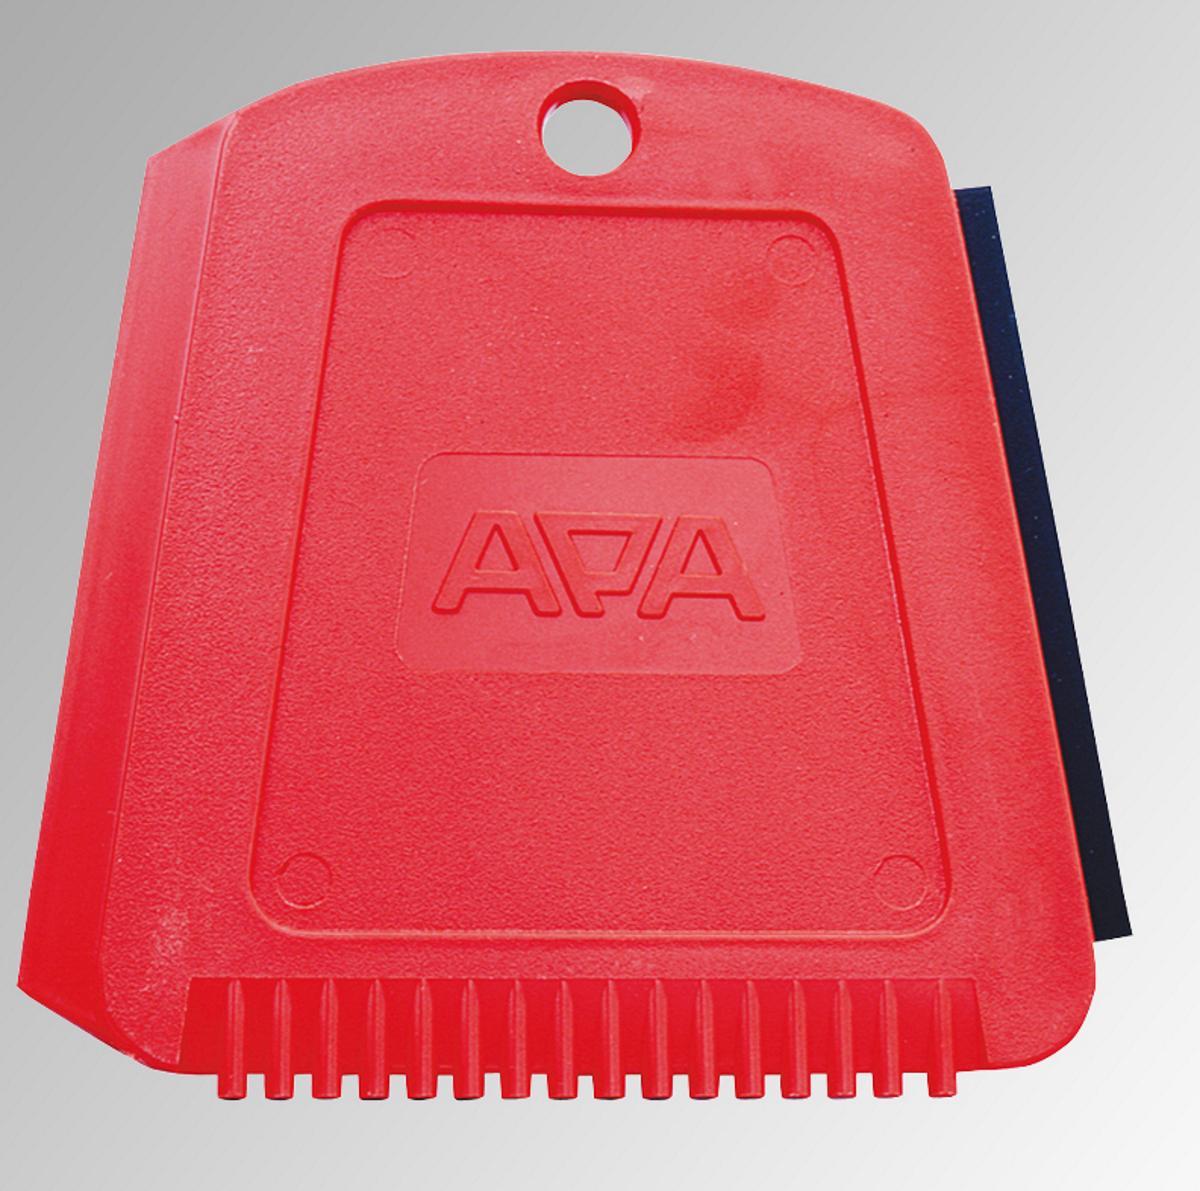 Name:  apa-trapez-eiskratzer-76138-0.jpg Views: 288 Size:  146.9 KB